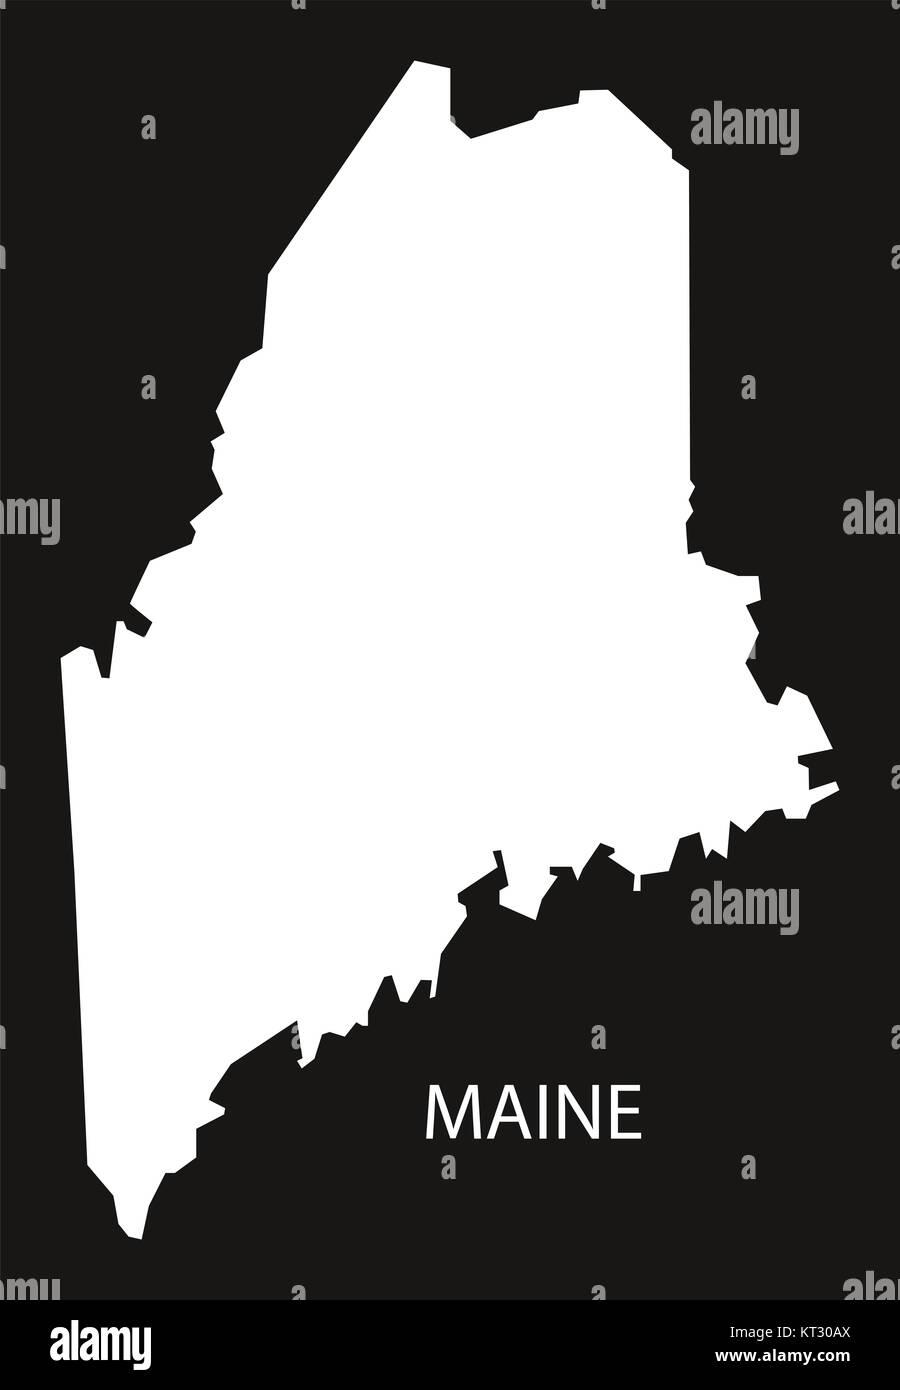 Maine Map Usa.Maine Usa Map Black Inverted Silhouette Stock Photo 169711218 Alamy